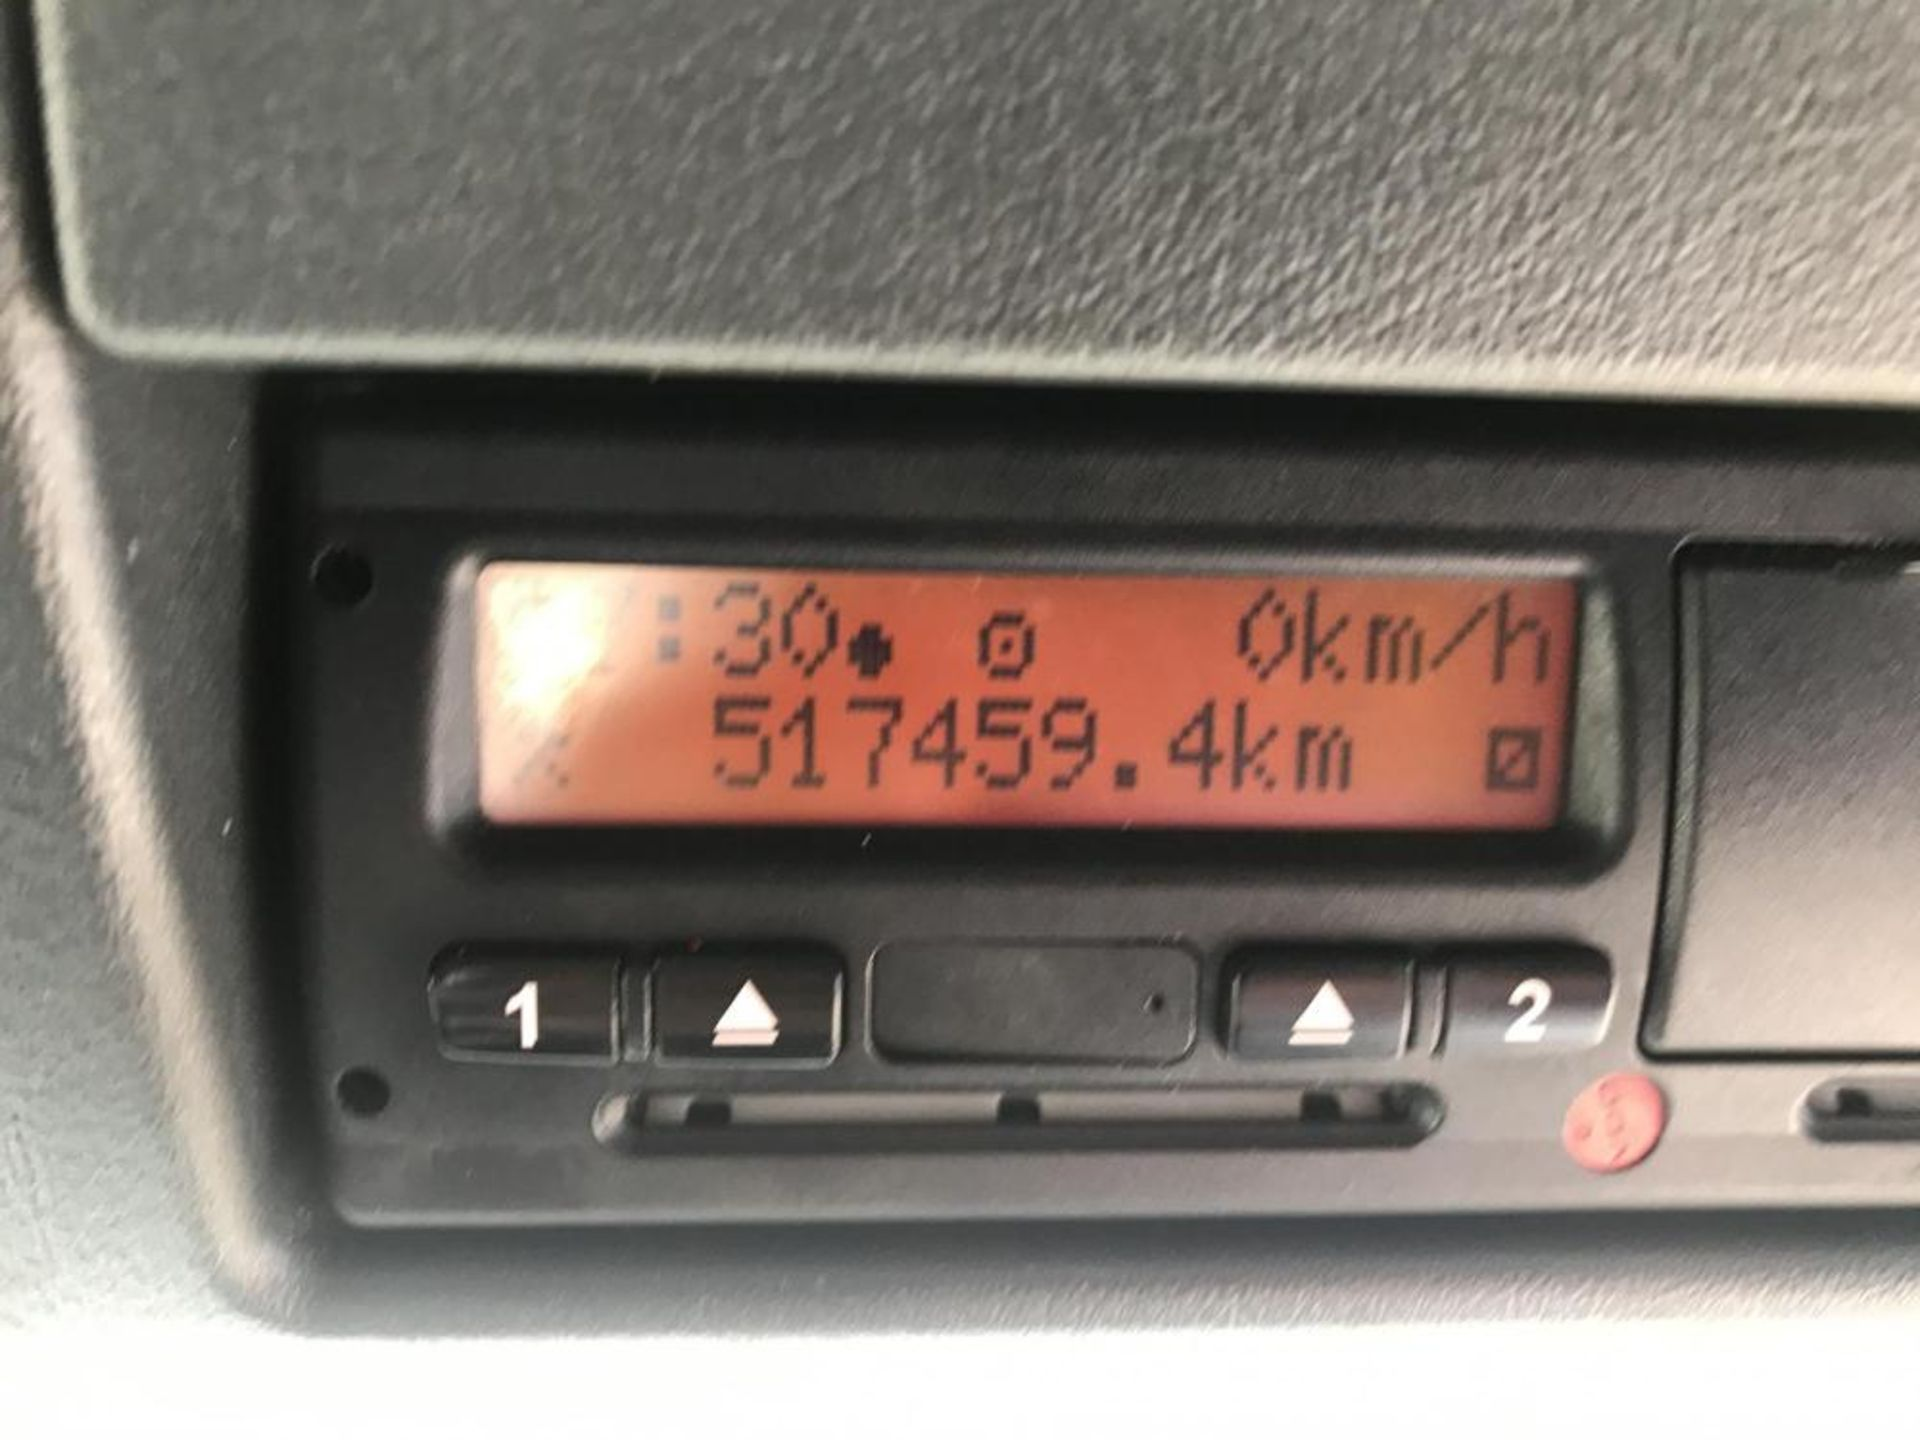 2012/12 REG MAN TG-M 18.250 4X2 LL L 6.9L DIESEL SLEEPER CAB AUTO GEARBOX GOOD CONDITION *PLUS VAT* - Image 14 of 15